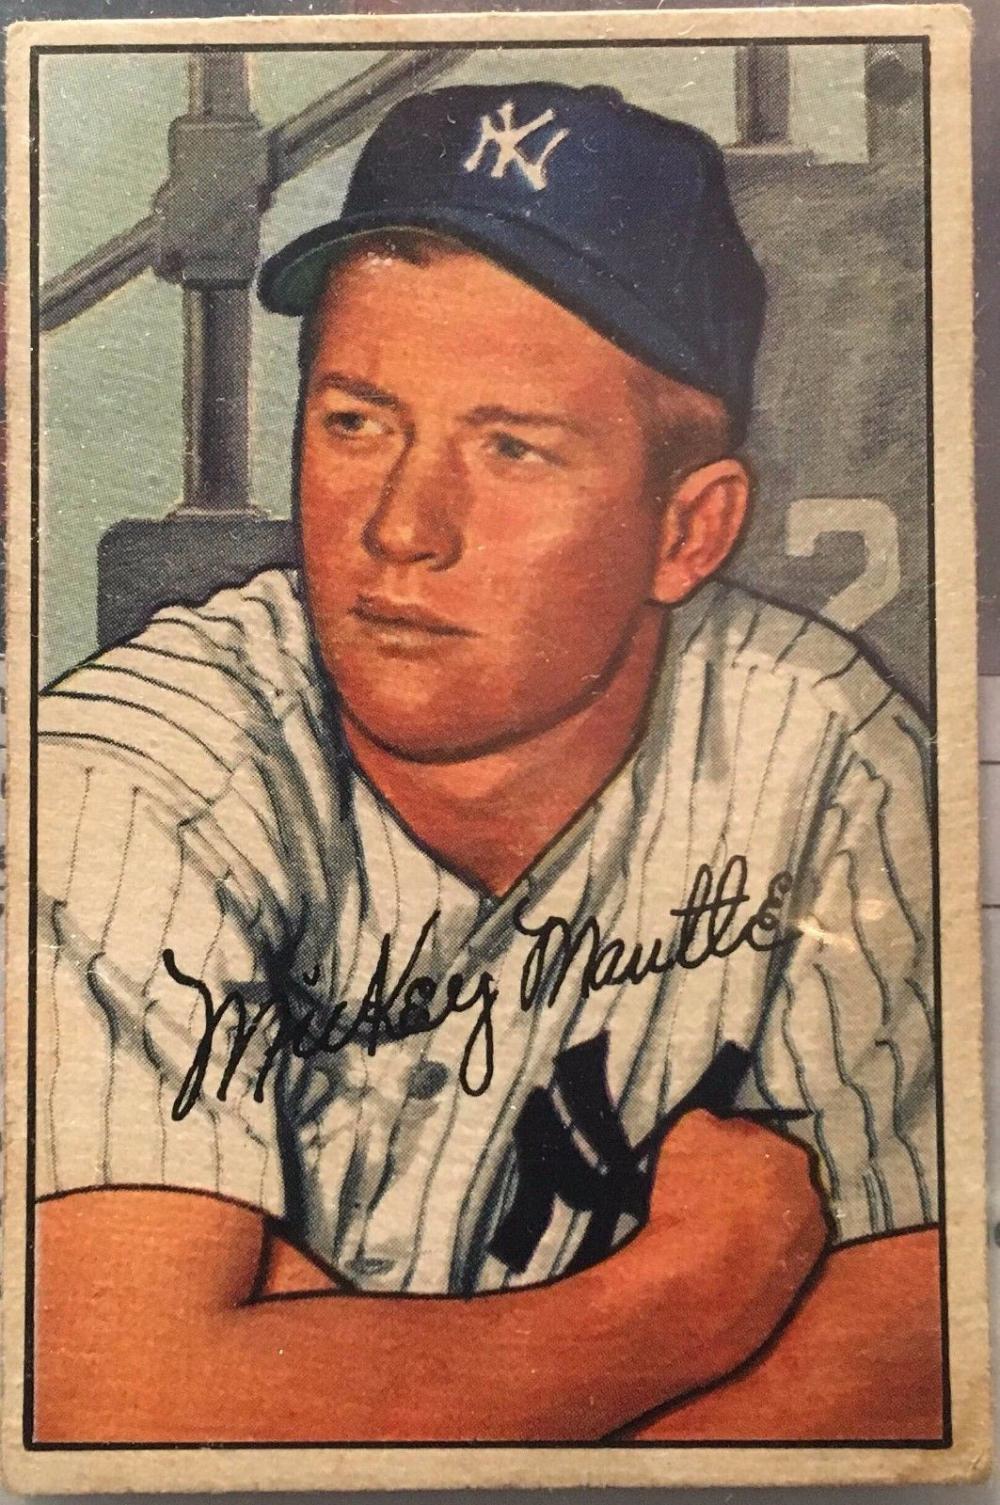 1952 Bowman Mickey Mantle New York Yankees 101 Baseball Card Wcoa App5k